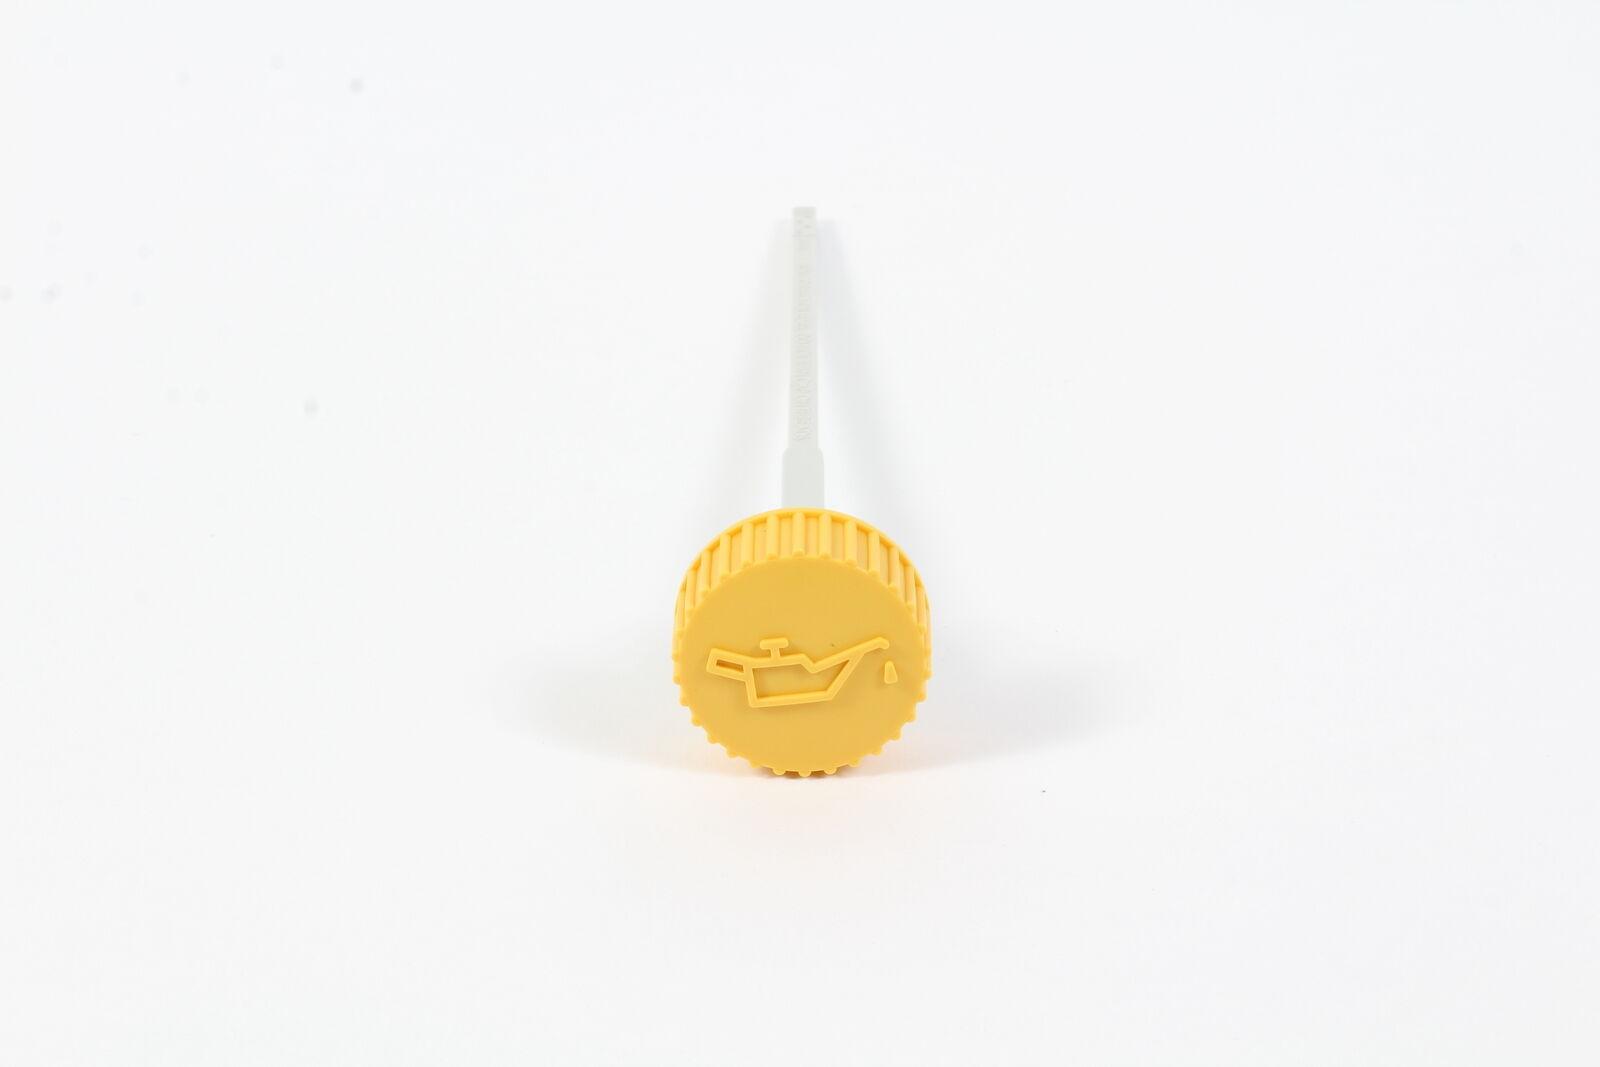 Genuine Kawasaki 14075-0707 Oil Filler Dipstick /& Cap Assembly Fits 14075-0037